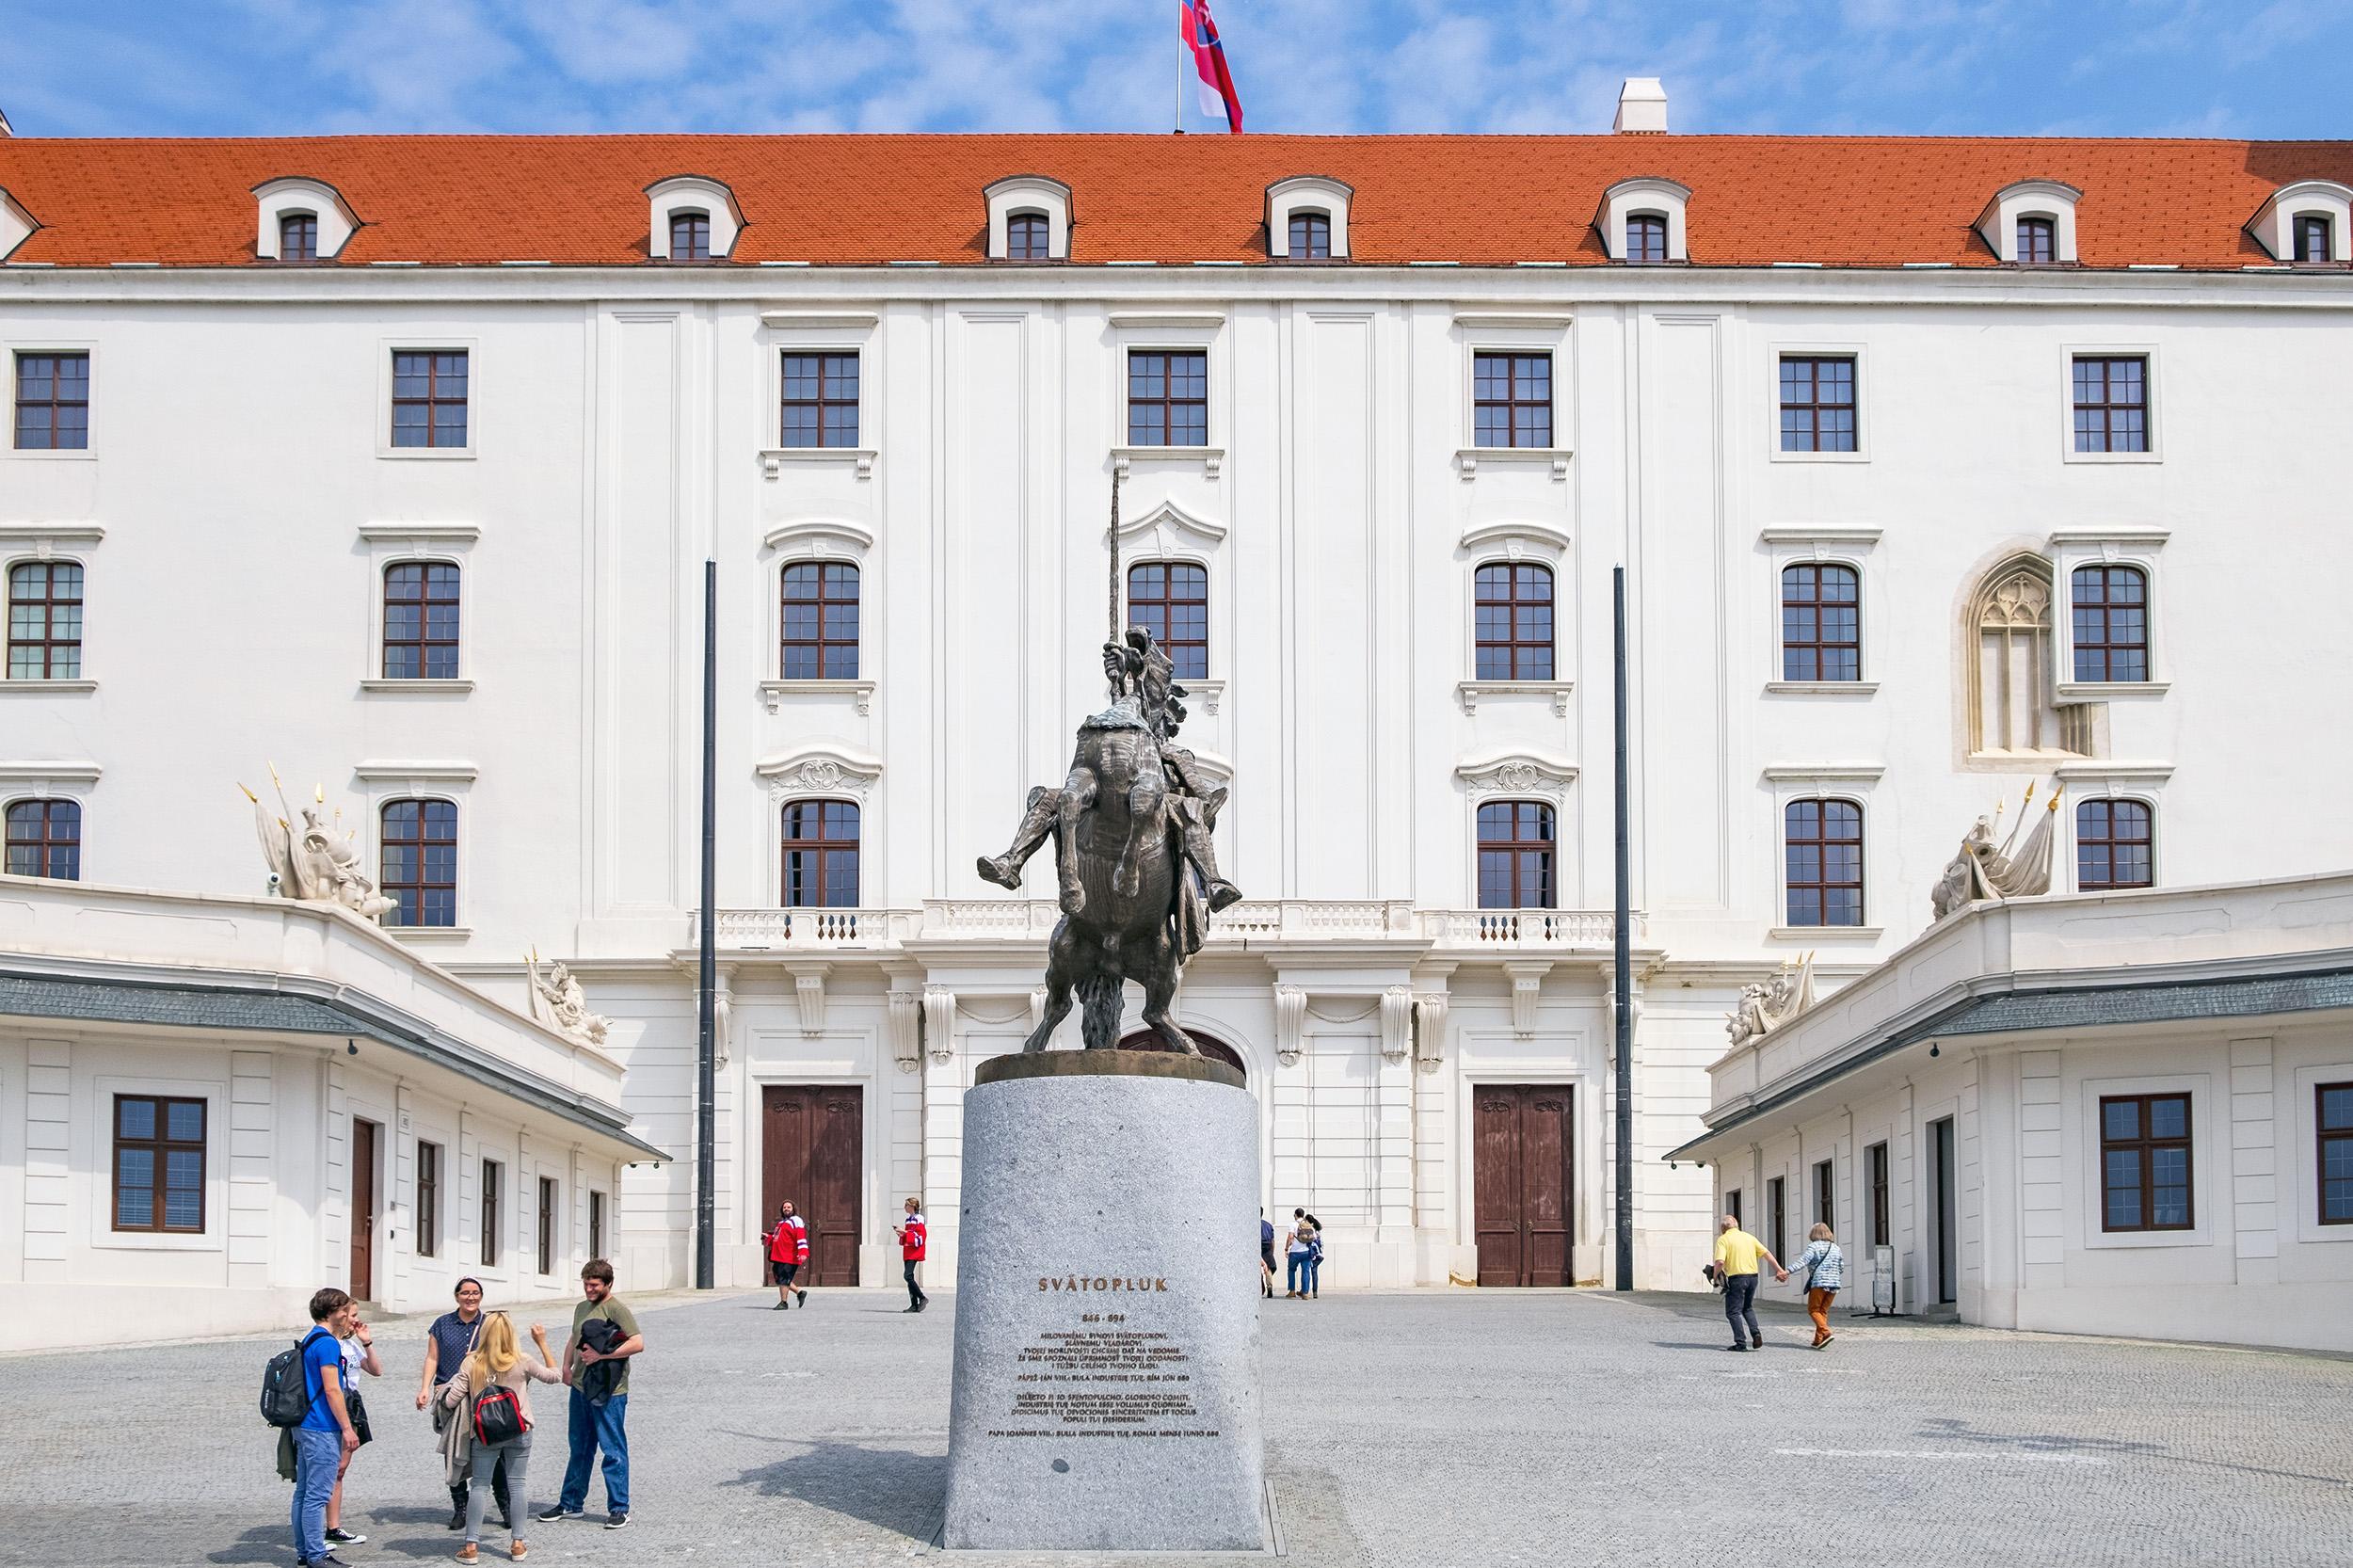 King Svätopluk Slottet i Bratislava